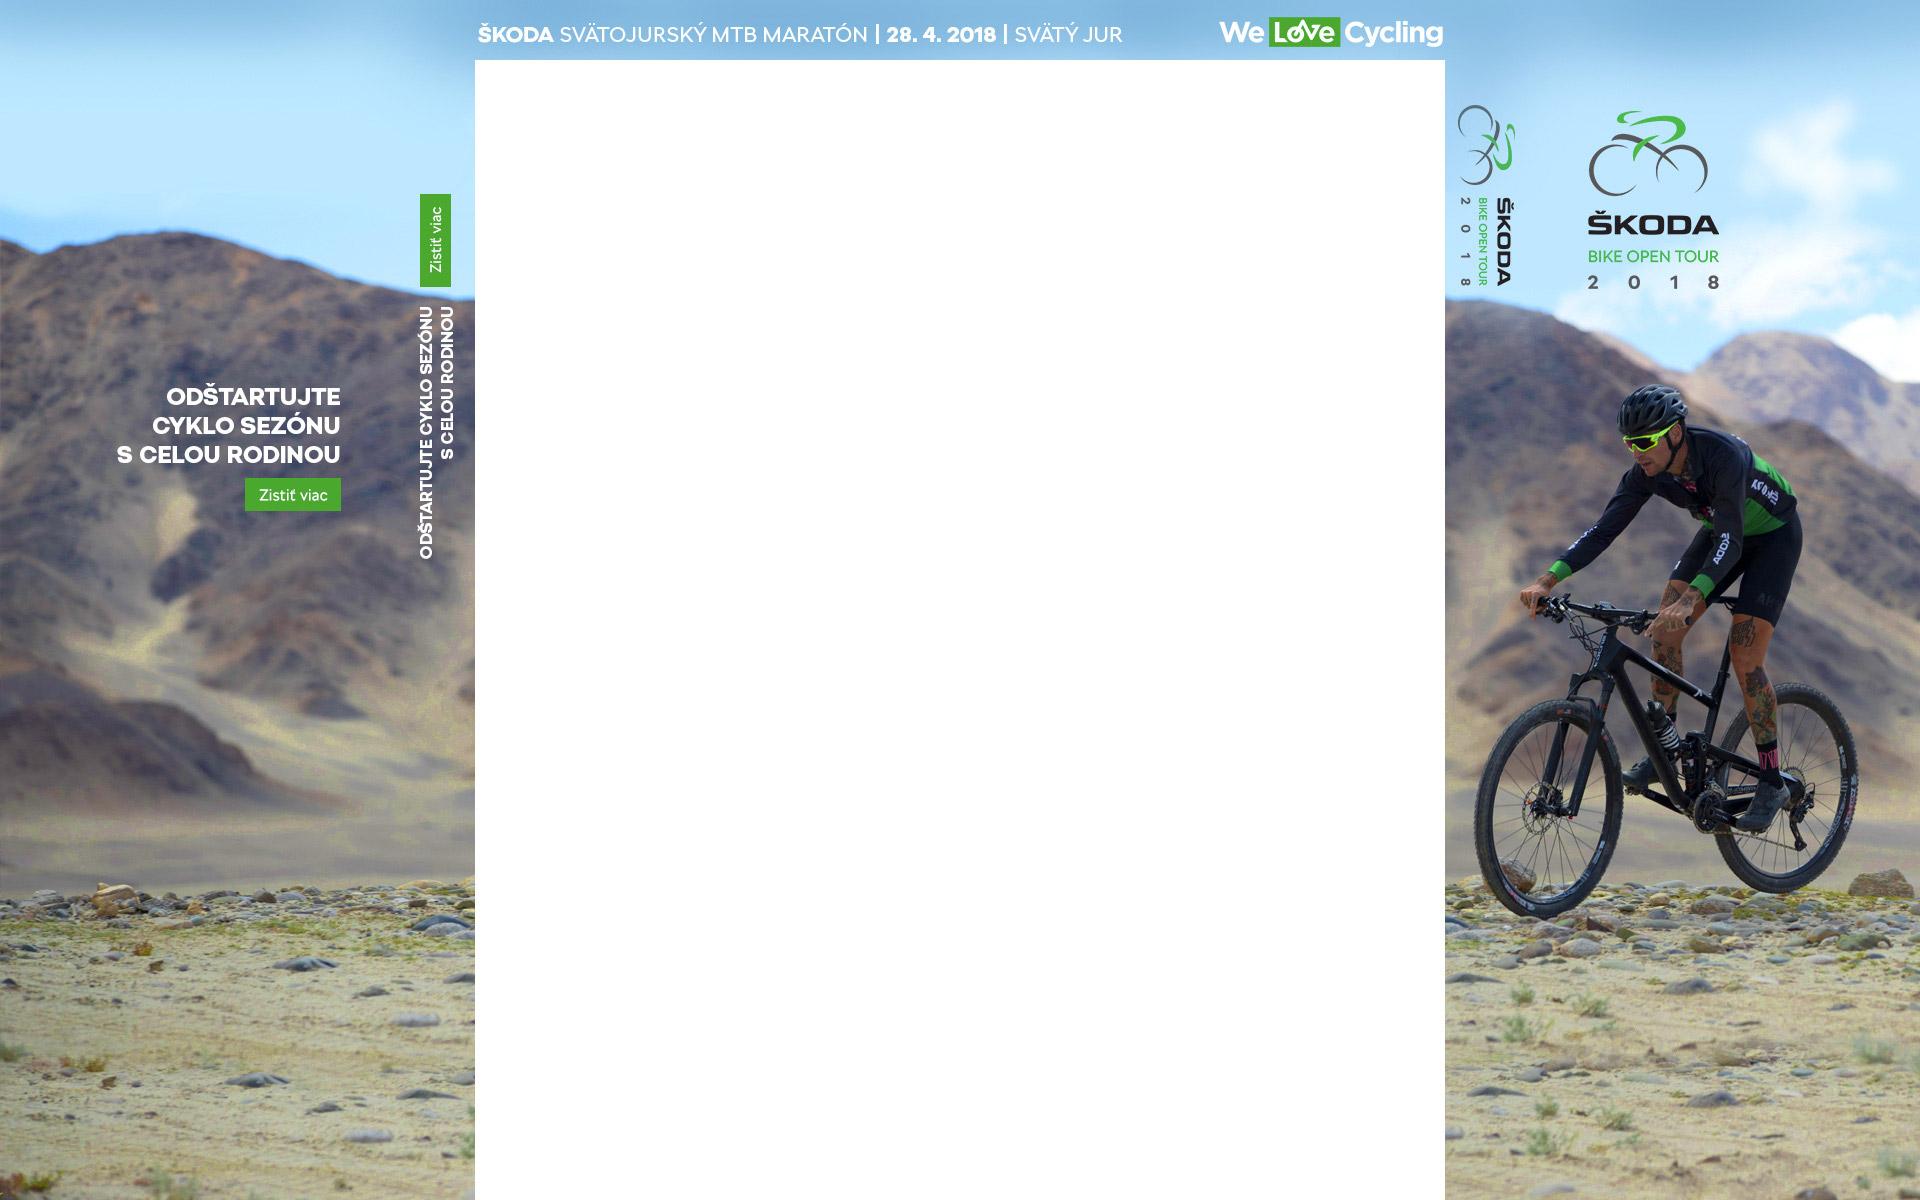 c4706ce0b Kolko rocne najazdite - Príspevok od MailoKE   MTBIKER Fórum - Slovenský  bike web